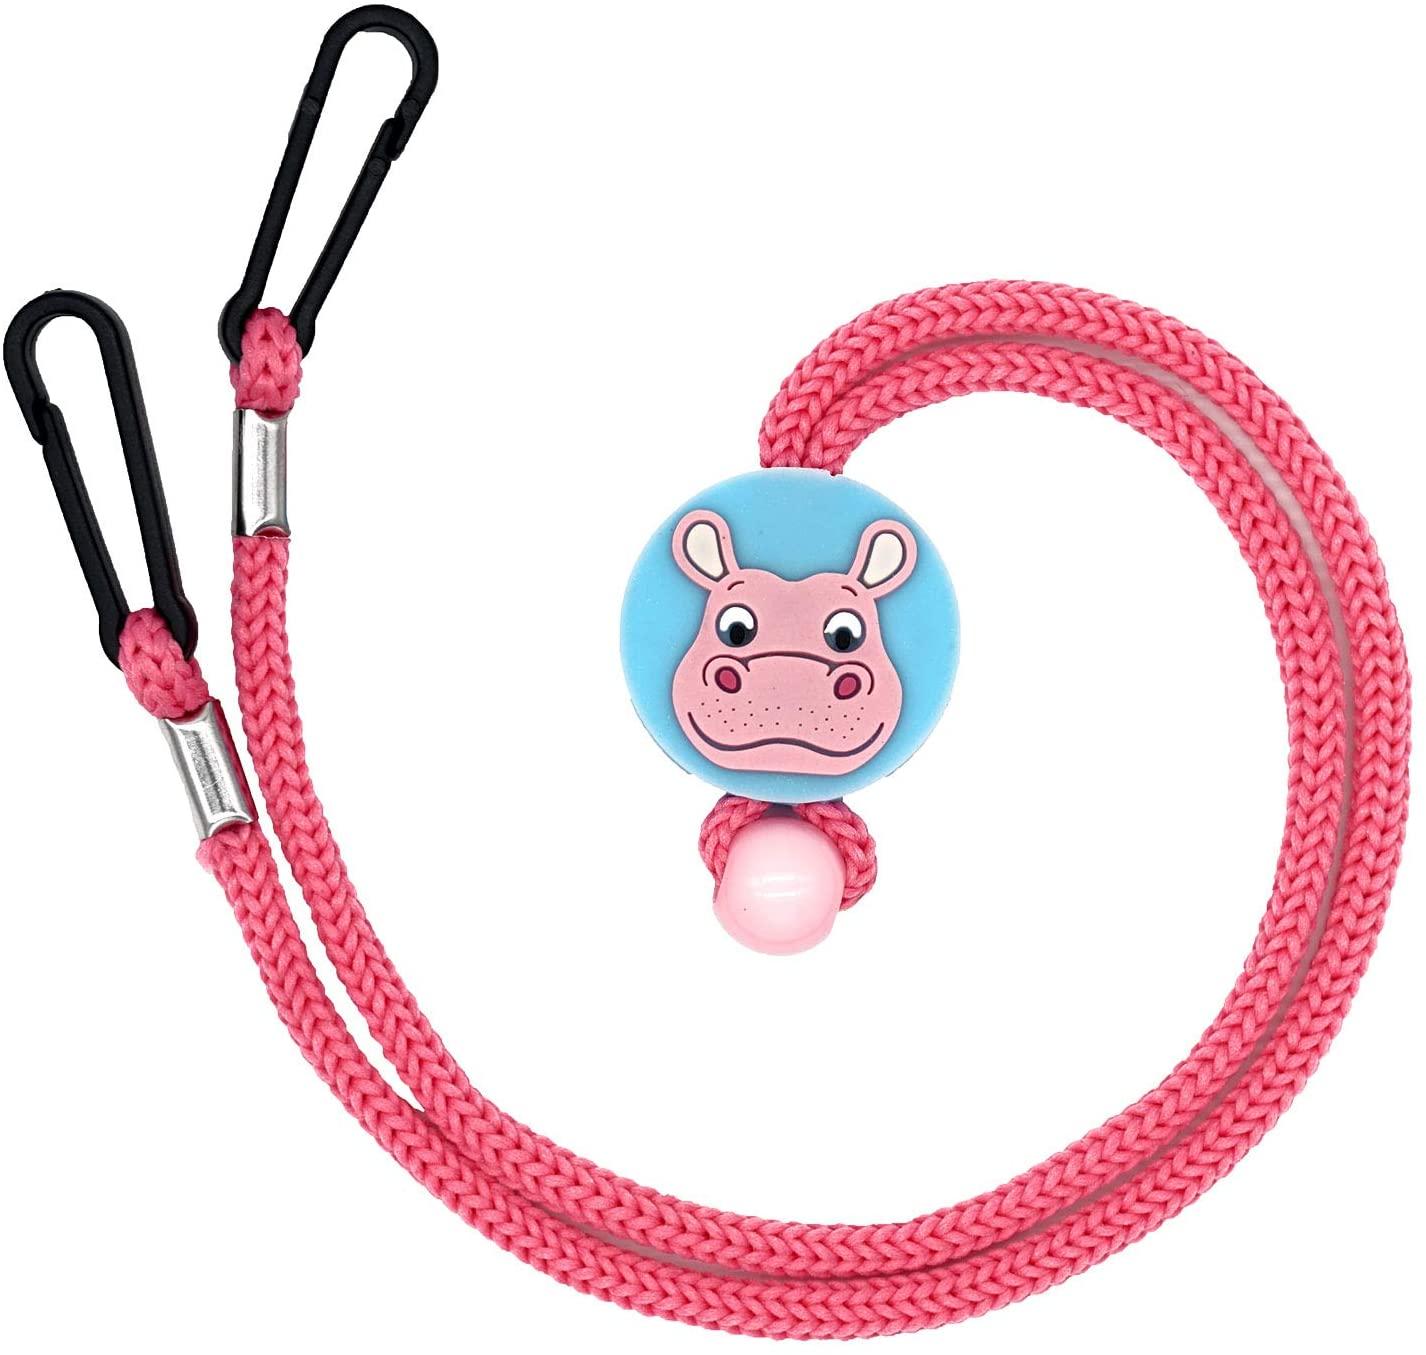 Mask Lanyard for Girls for School Cute Breakaway Mask Straps Clips Mask Holder Hanger Adjustable Buckle String Rope Cord Lock Toggles Stopper Slider Fastener Extender for Kids Face Mask (Pink)